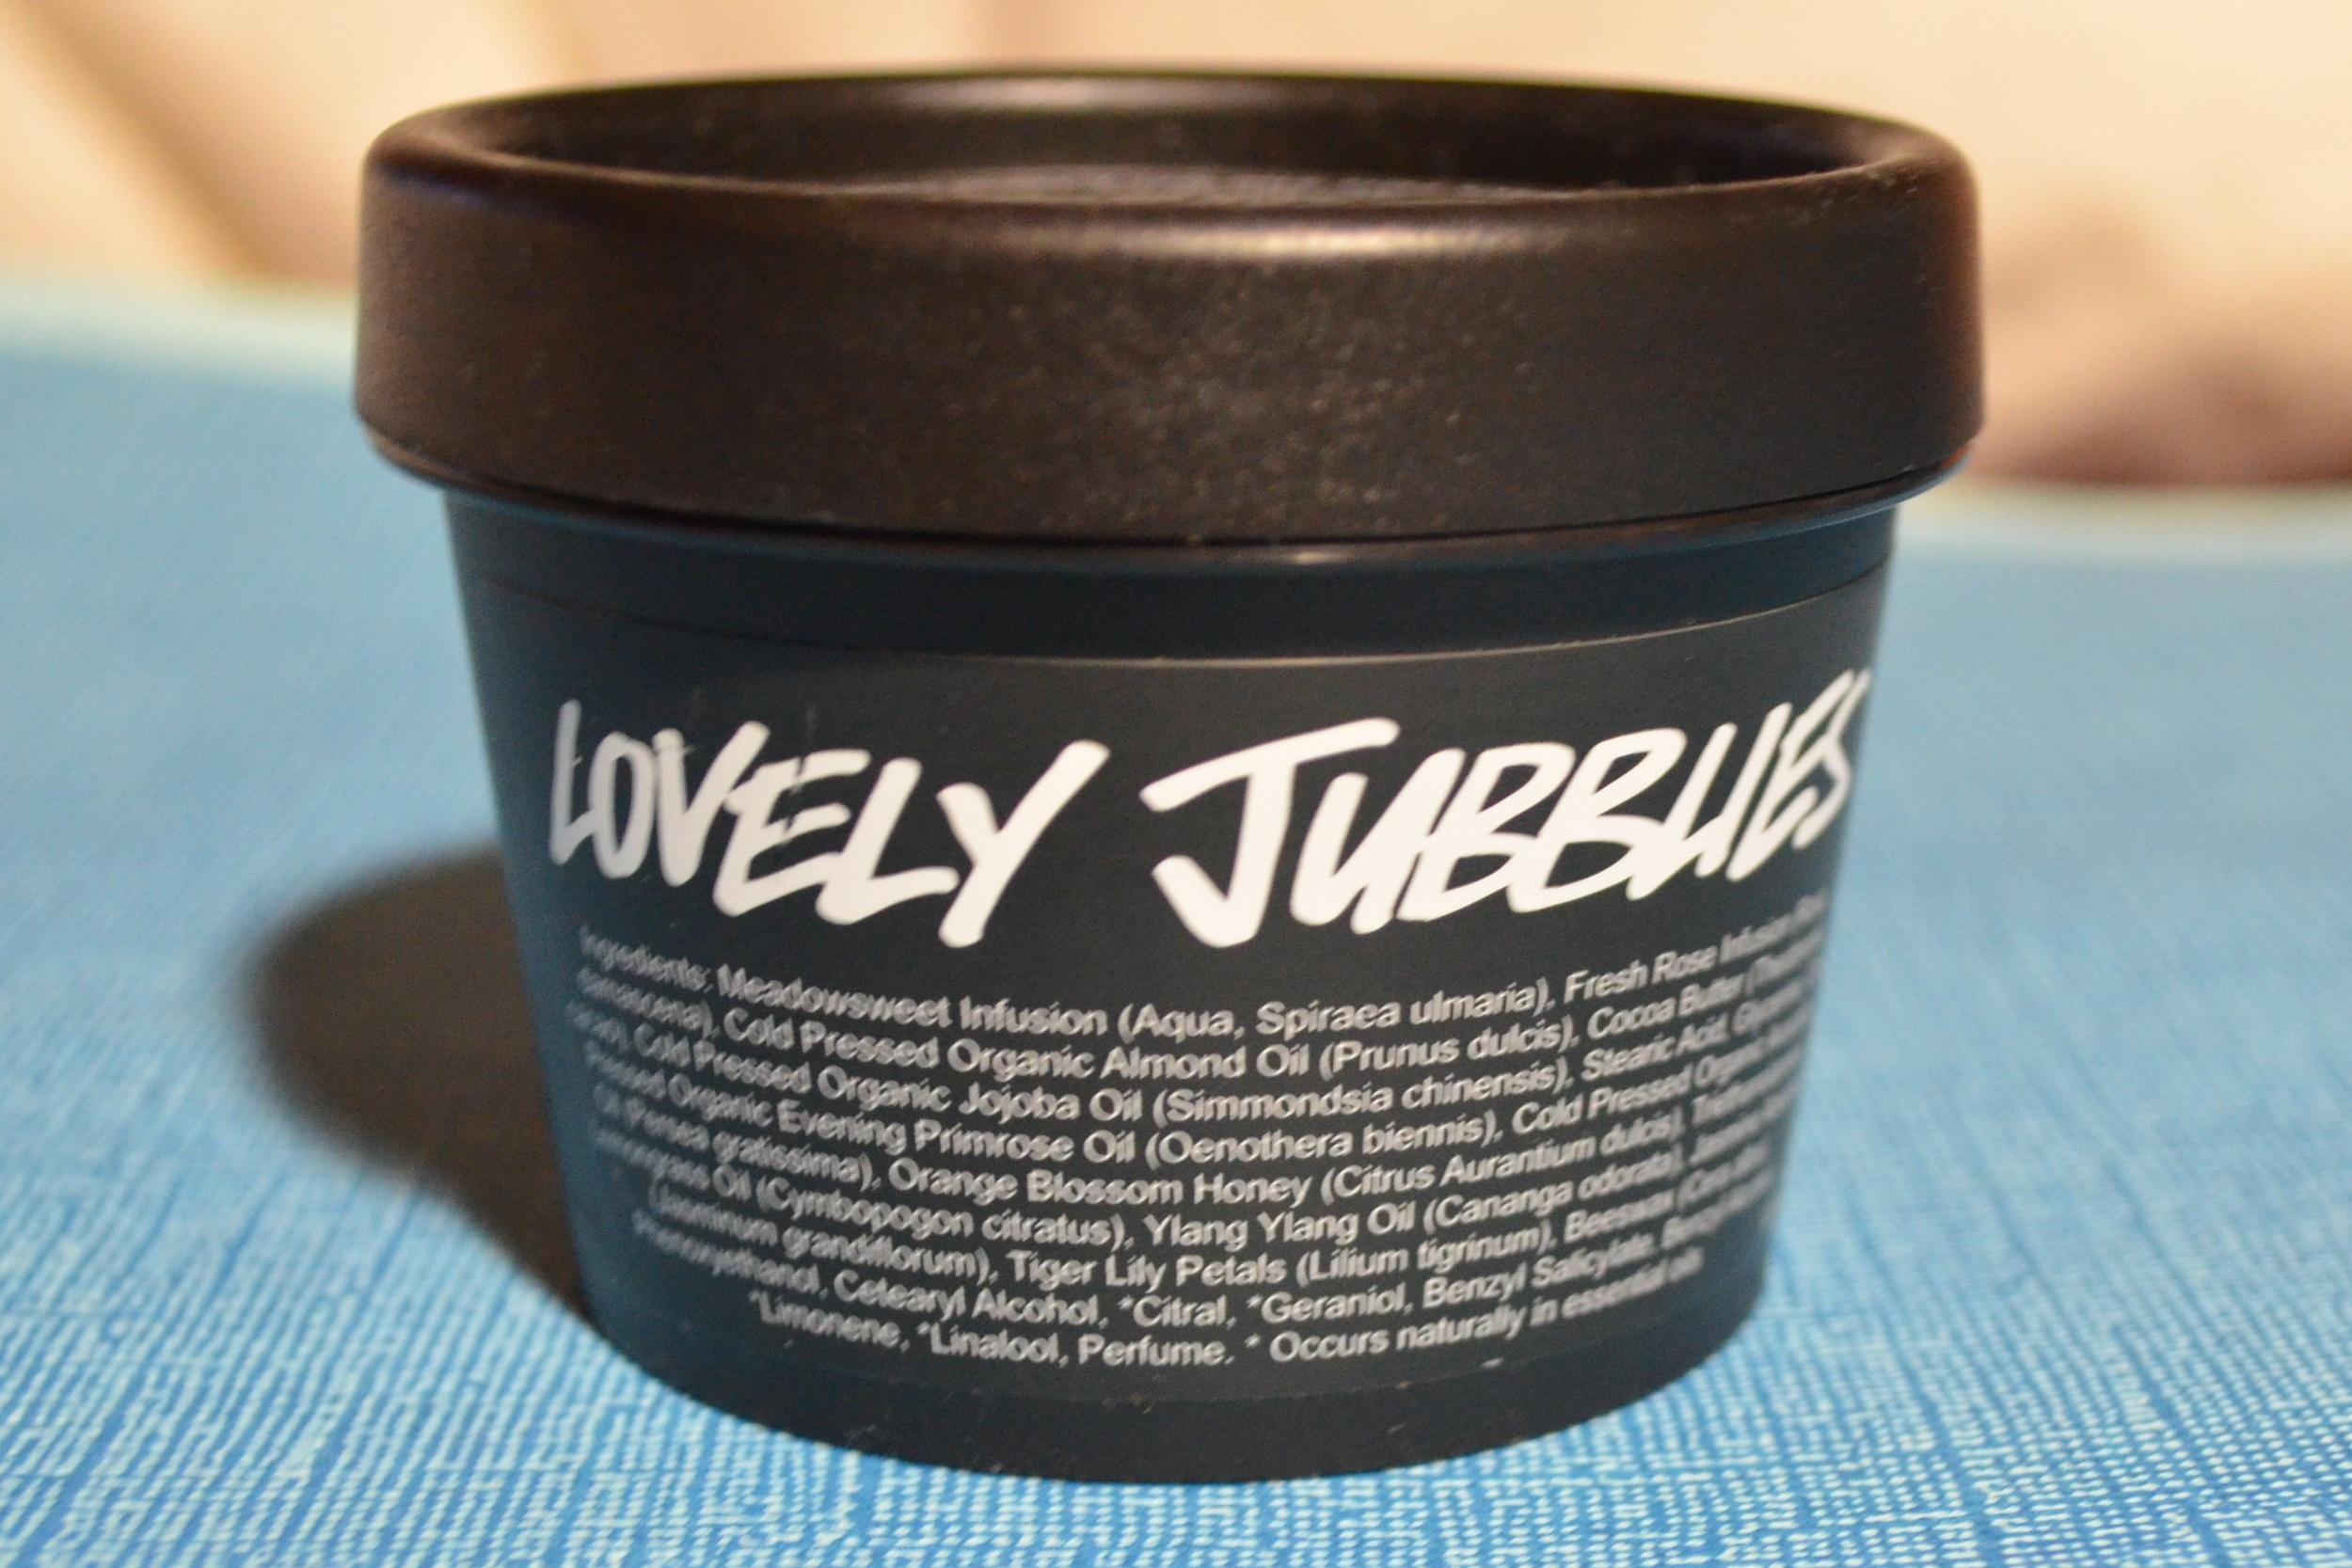 lush lovely jubblies ingredients